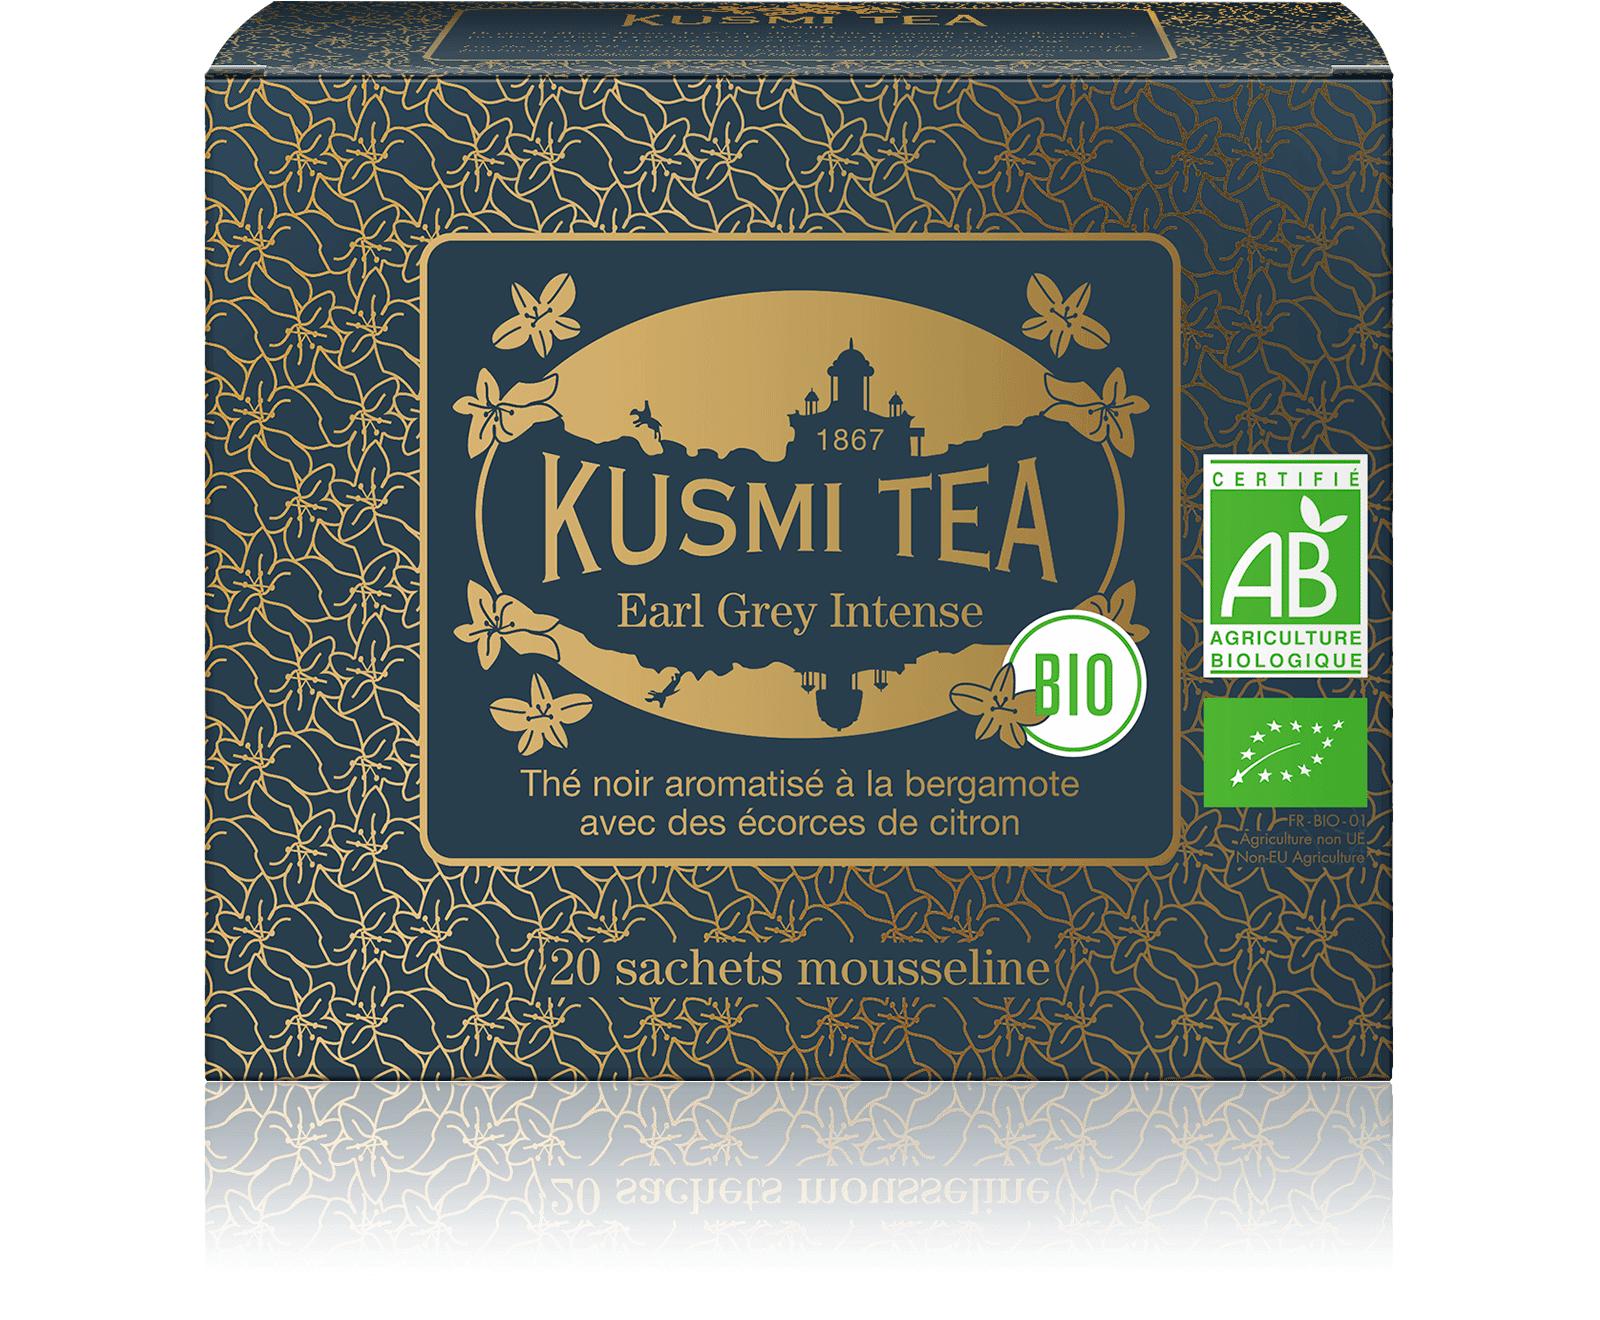 KUSMI TEA Earl Grey Intense bio - Thé noir, bergamote, citron - Sachets de thé - Kusmi Tea